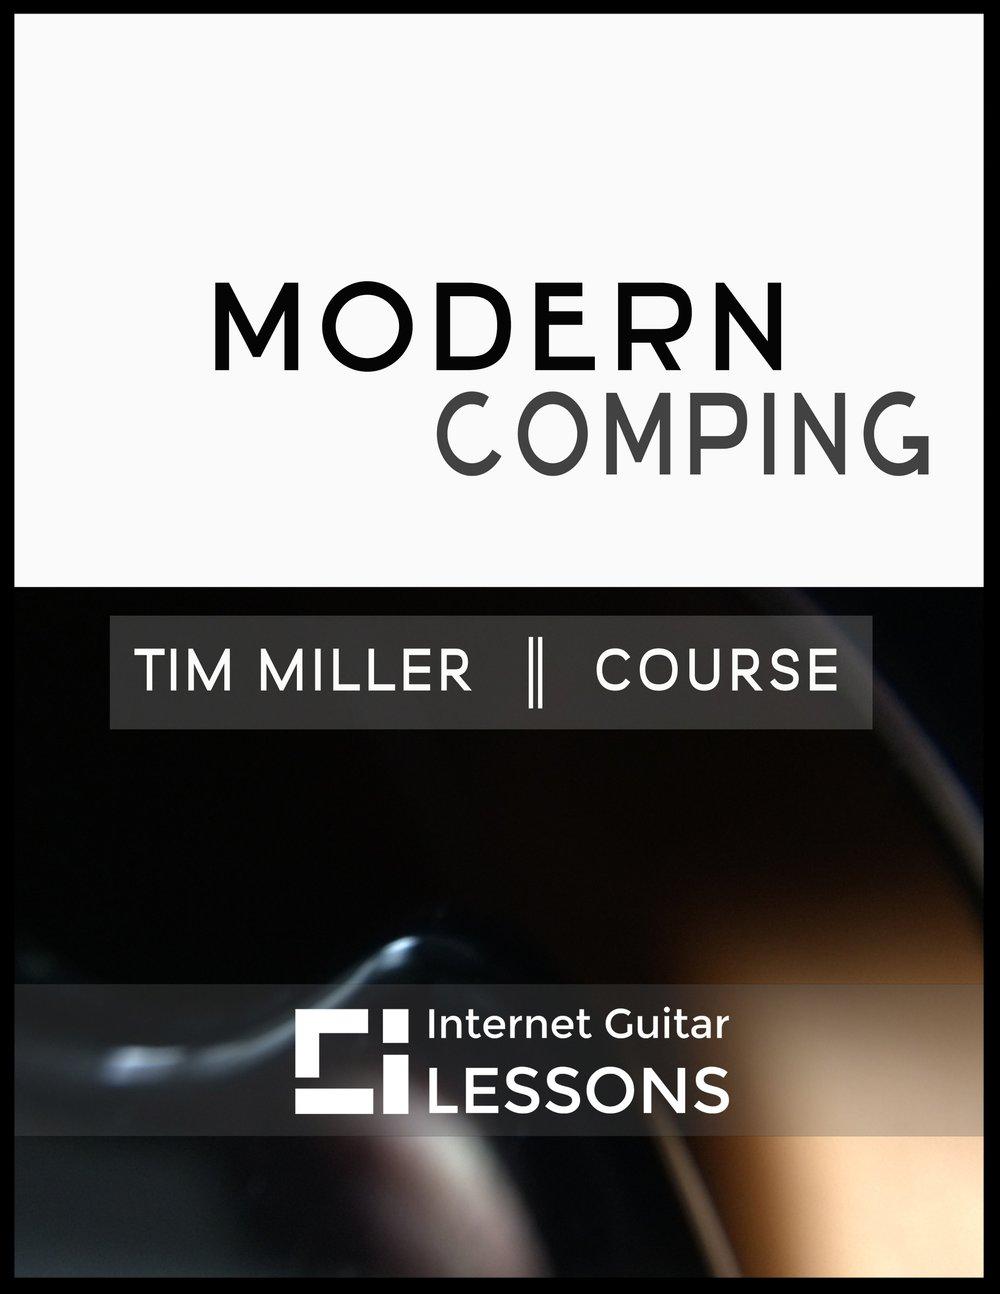 Modern Comping 1.17 flat.jpg